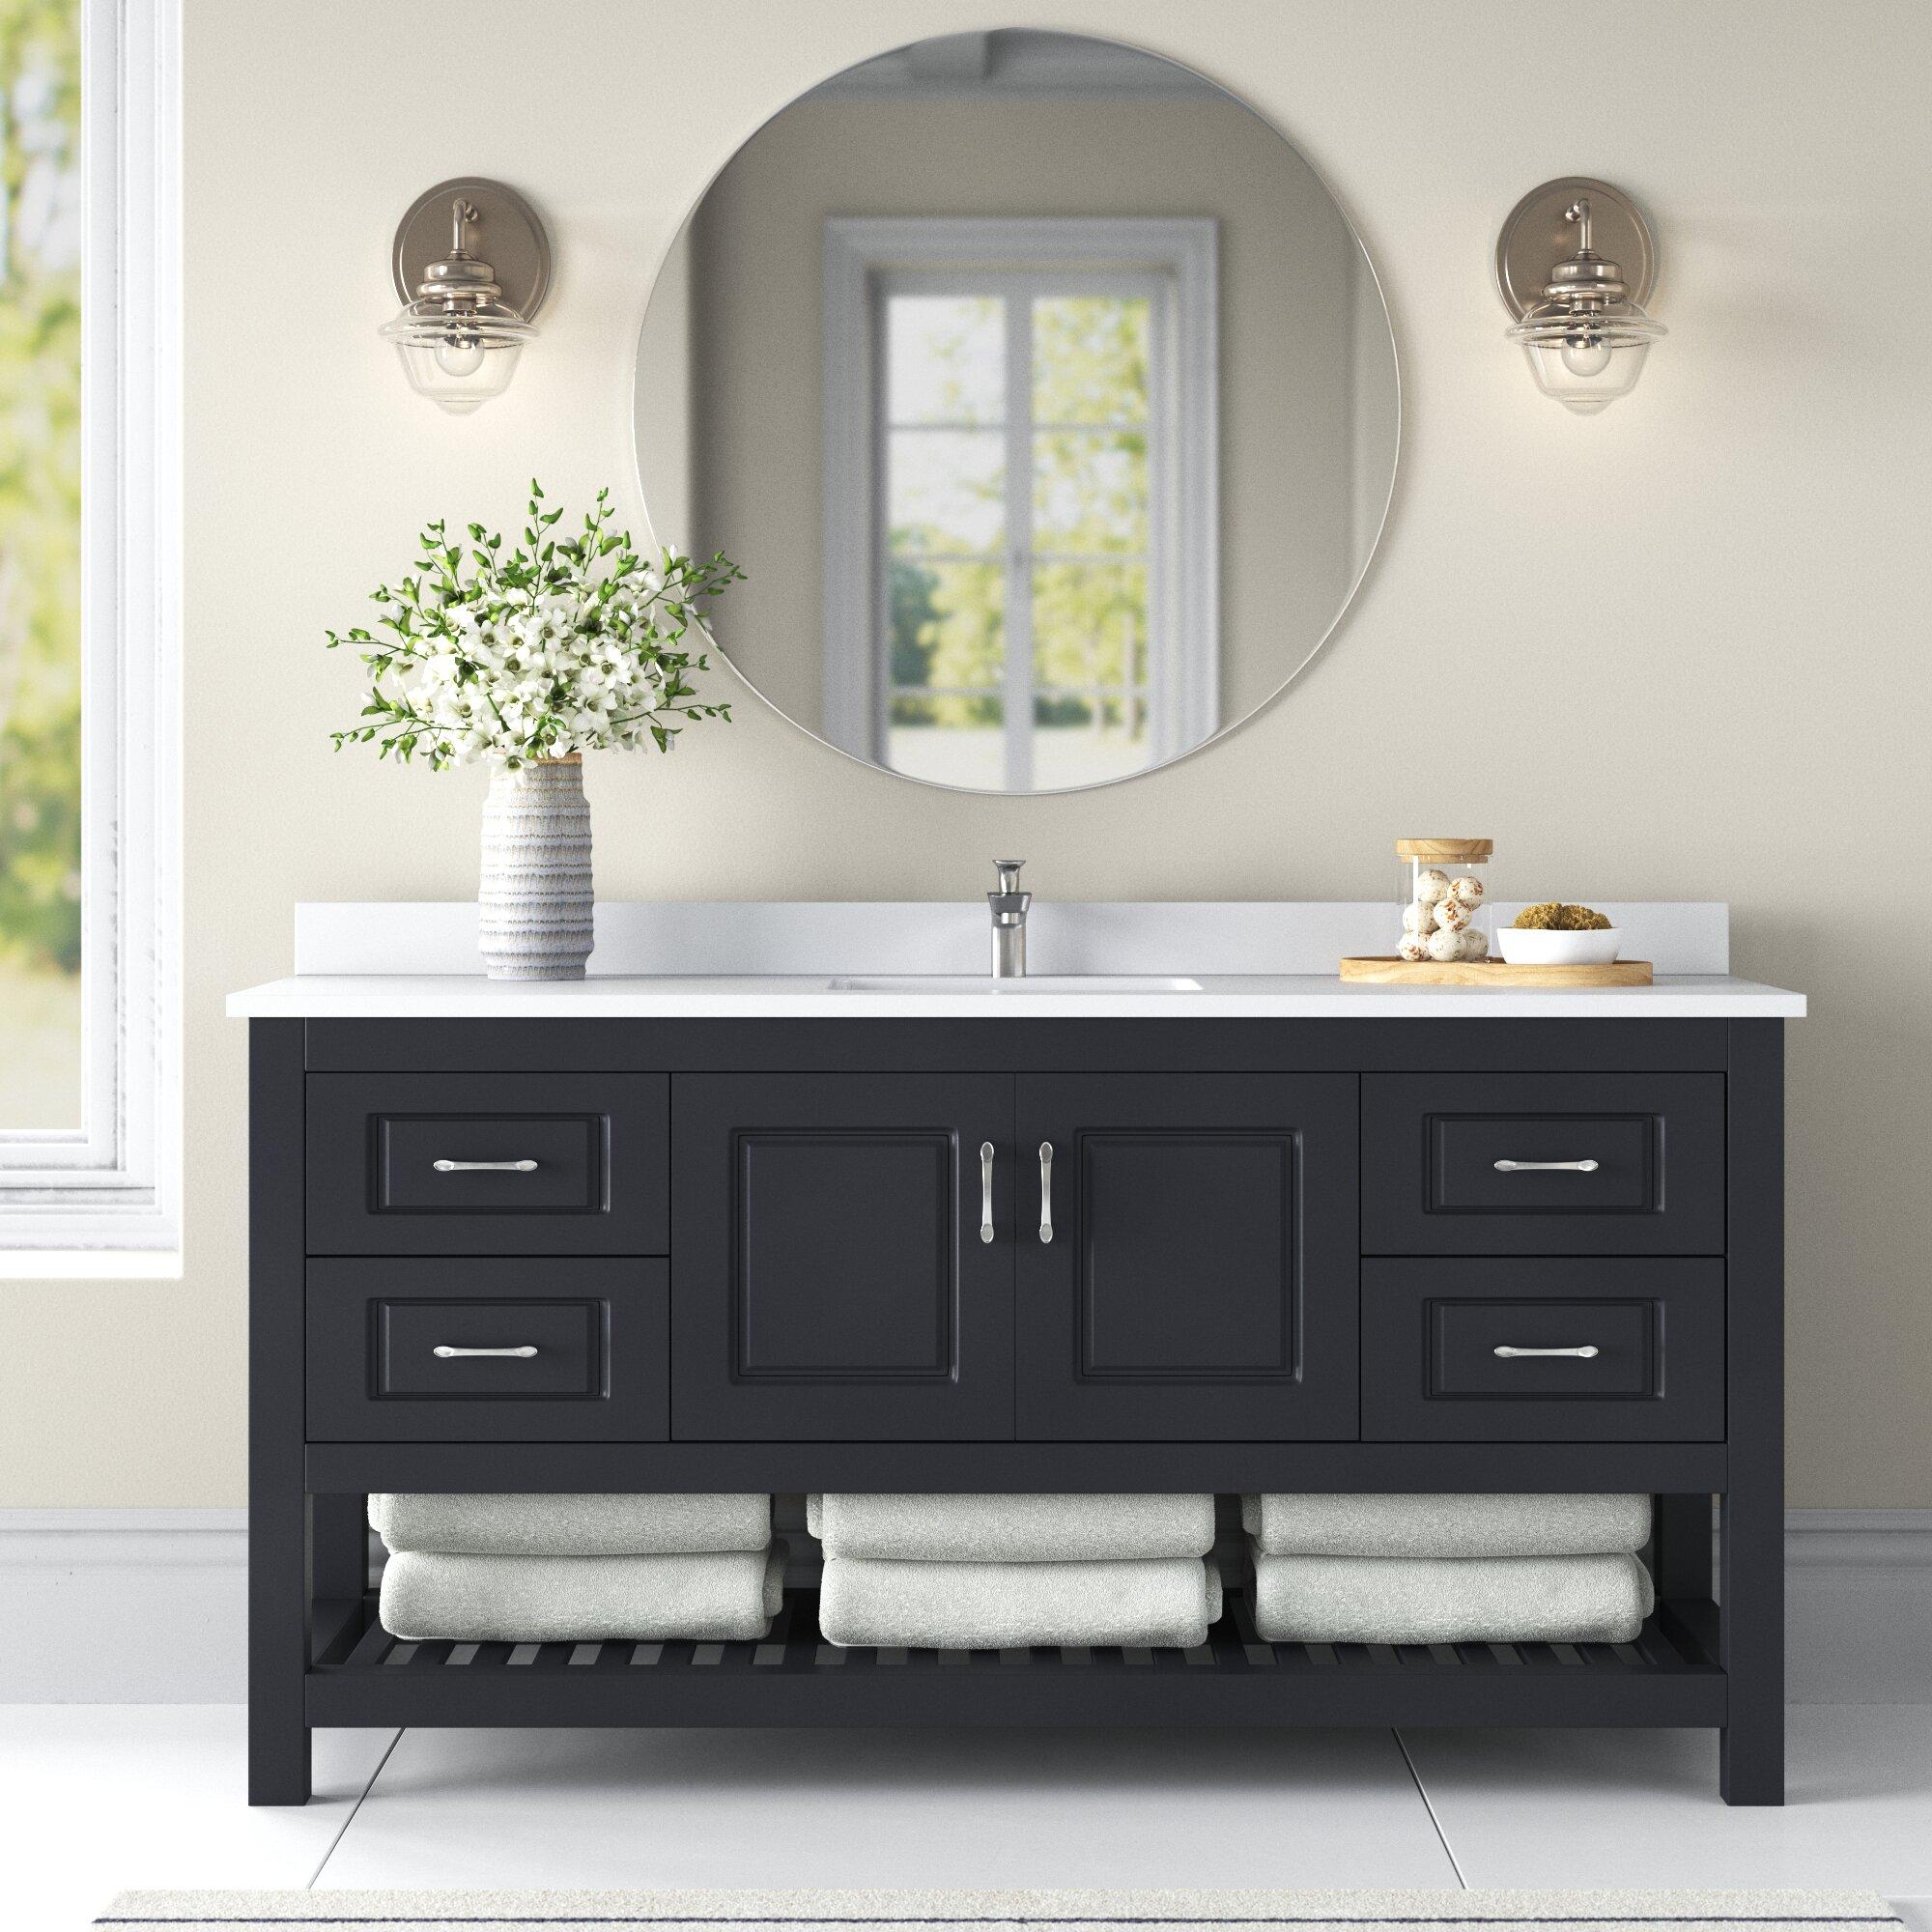 Needville 59 Single Bathroom Vanity Set Reviews Joss Main